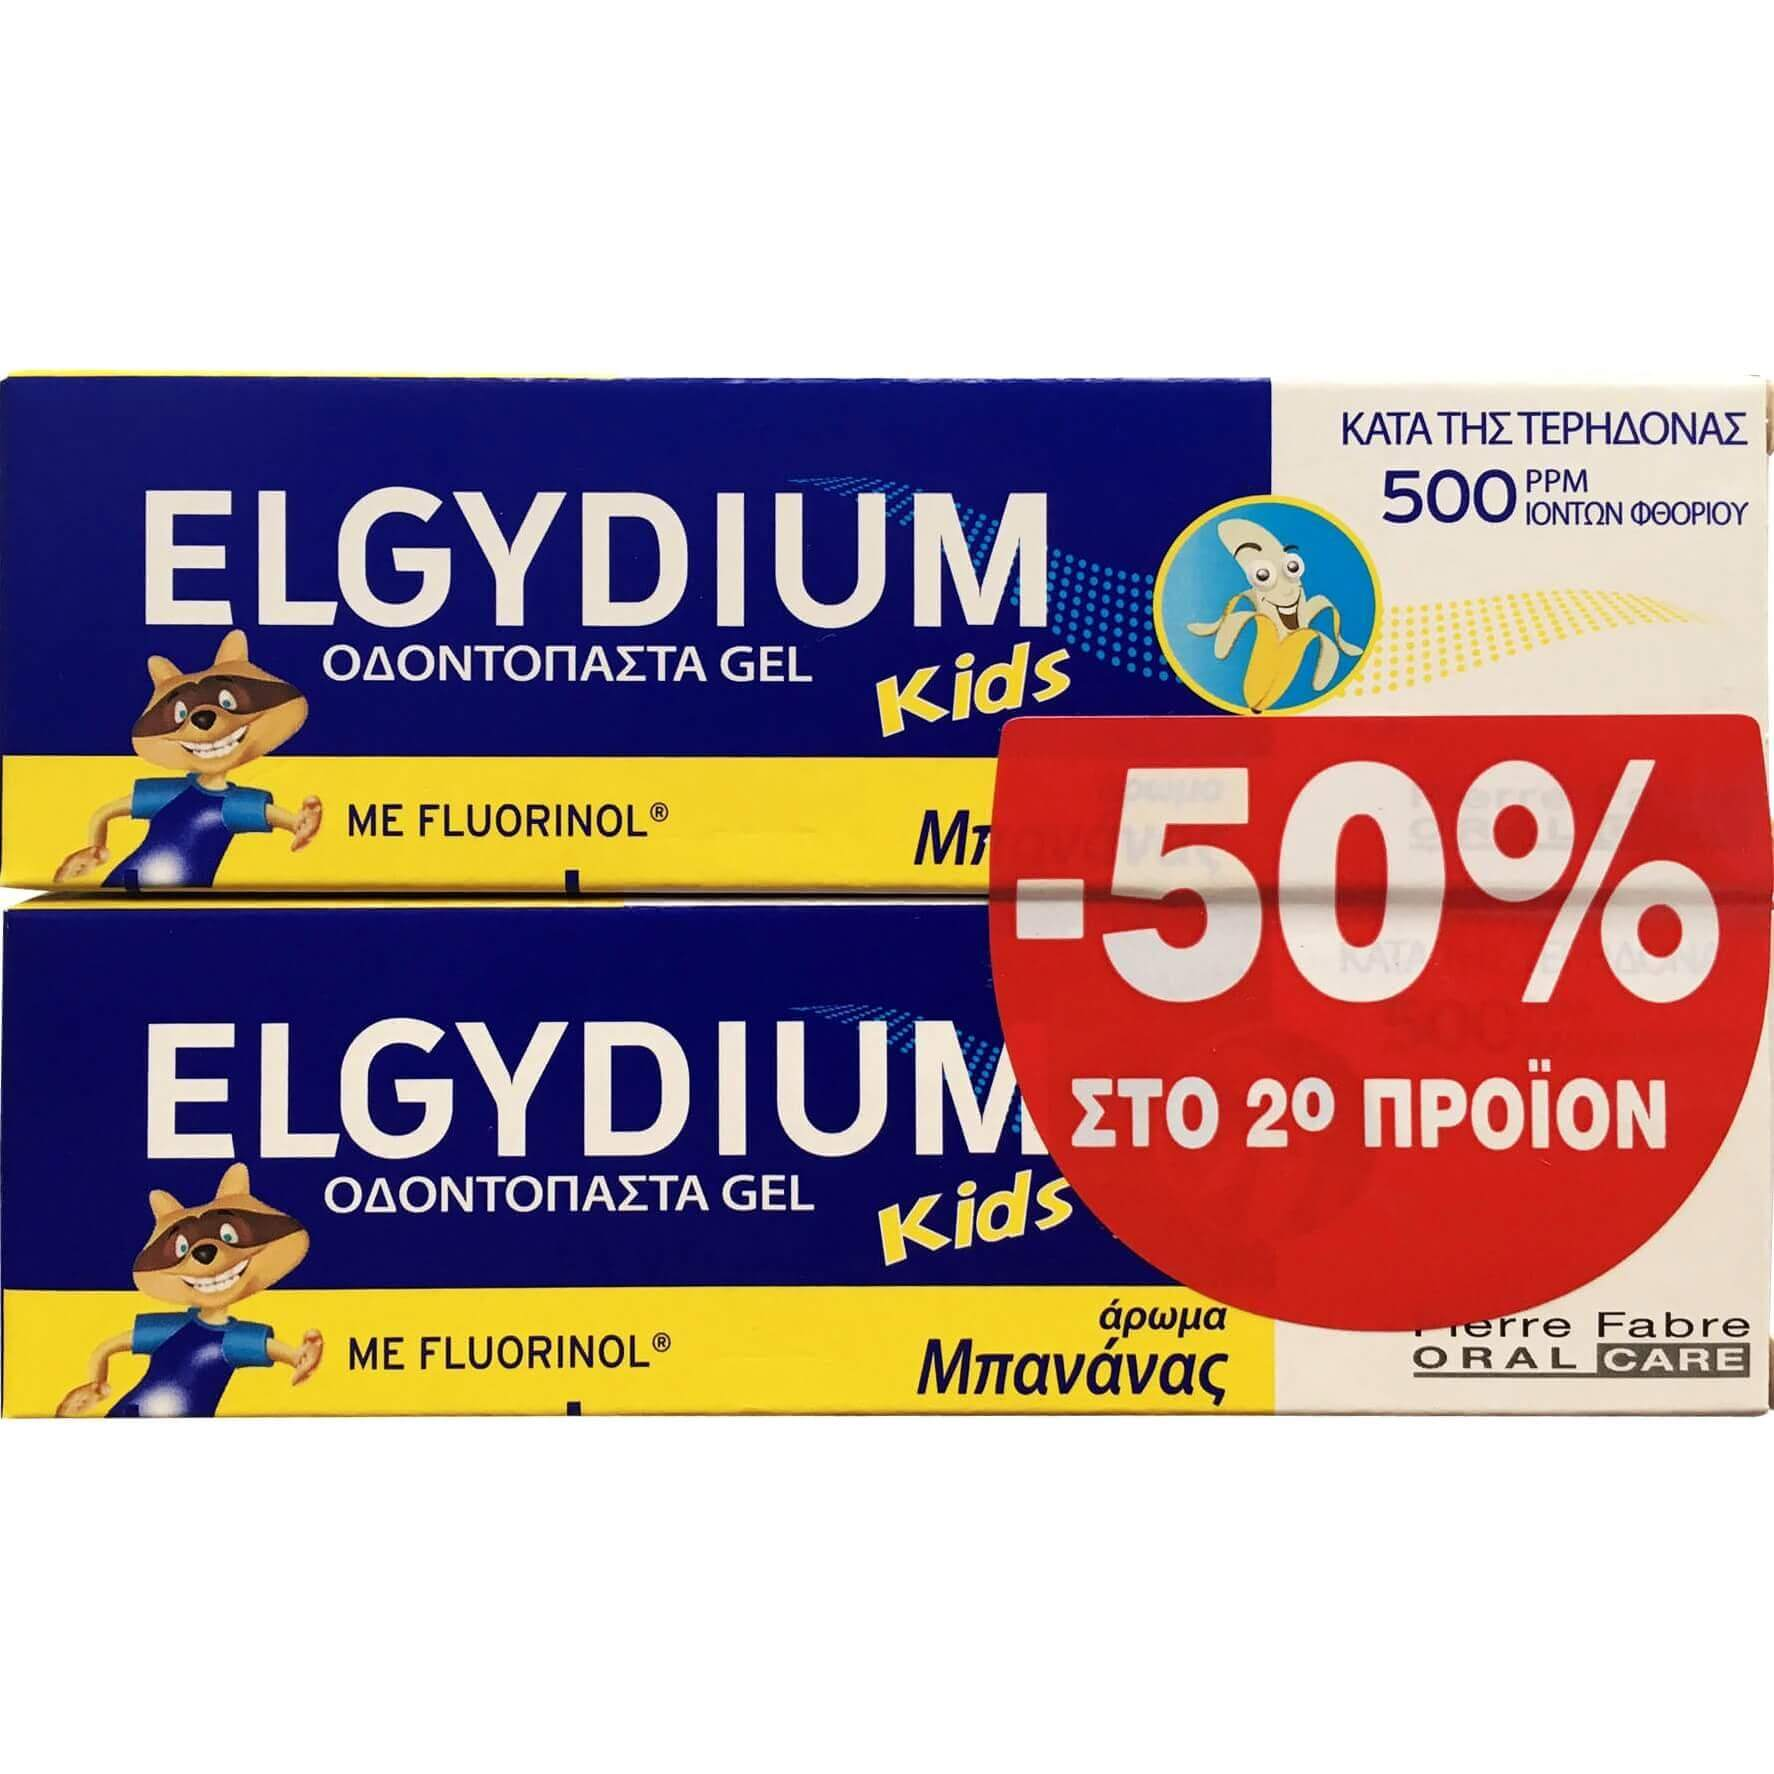 Elgydium Kids Toothpaste Gel Παιδική Οδοντόπαστα Από2 Έως 6 Ετών με Γεύση Μπανάνα 500ppm 50mlPromo -50% στο 2ο Προϊόν